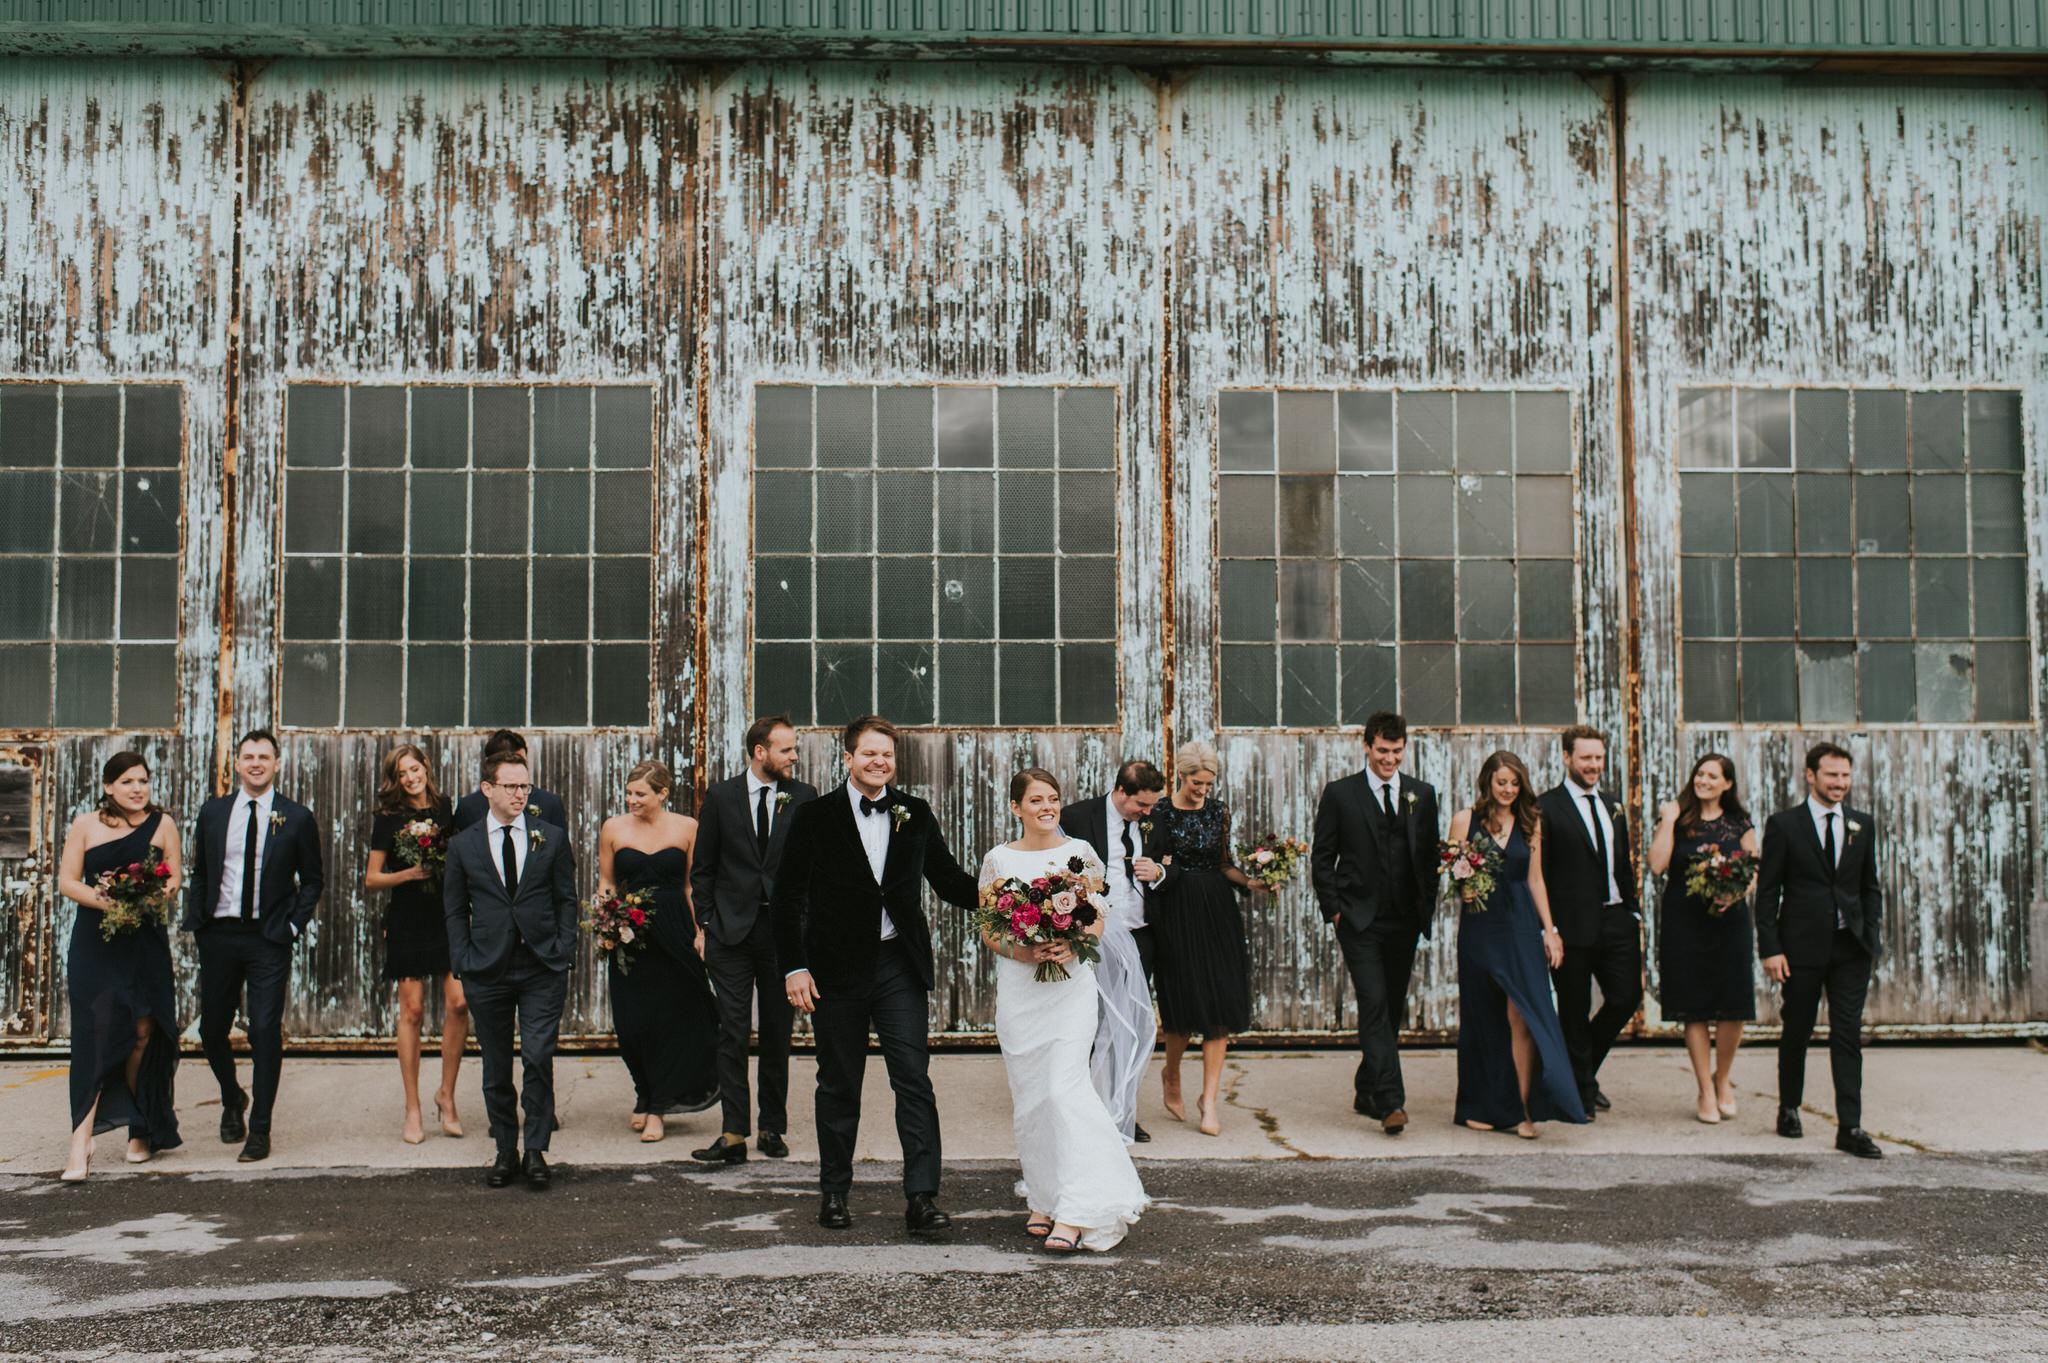 scarletoneillphotography_weddingphotography_prince edward county weddings054.JPG